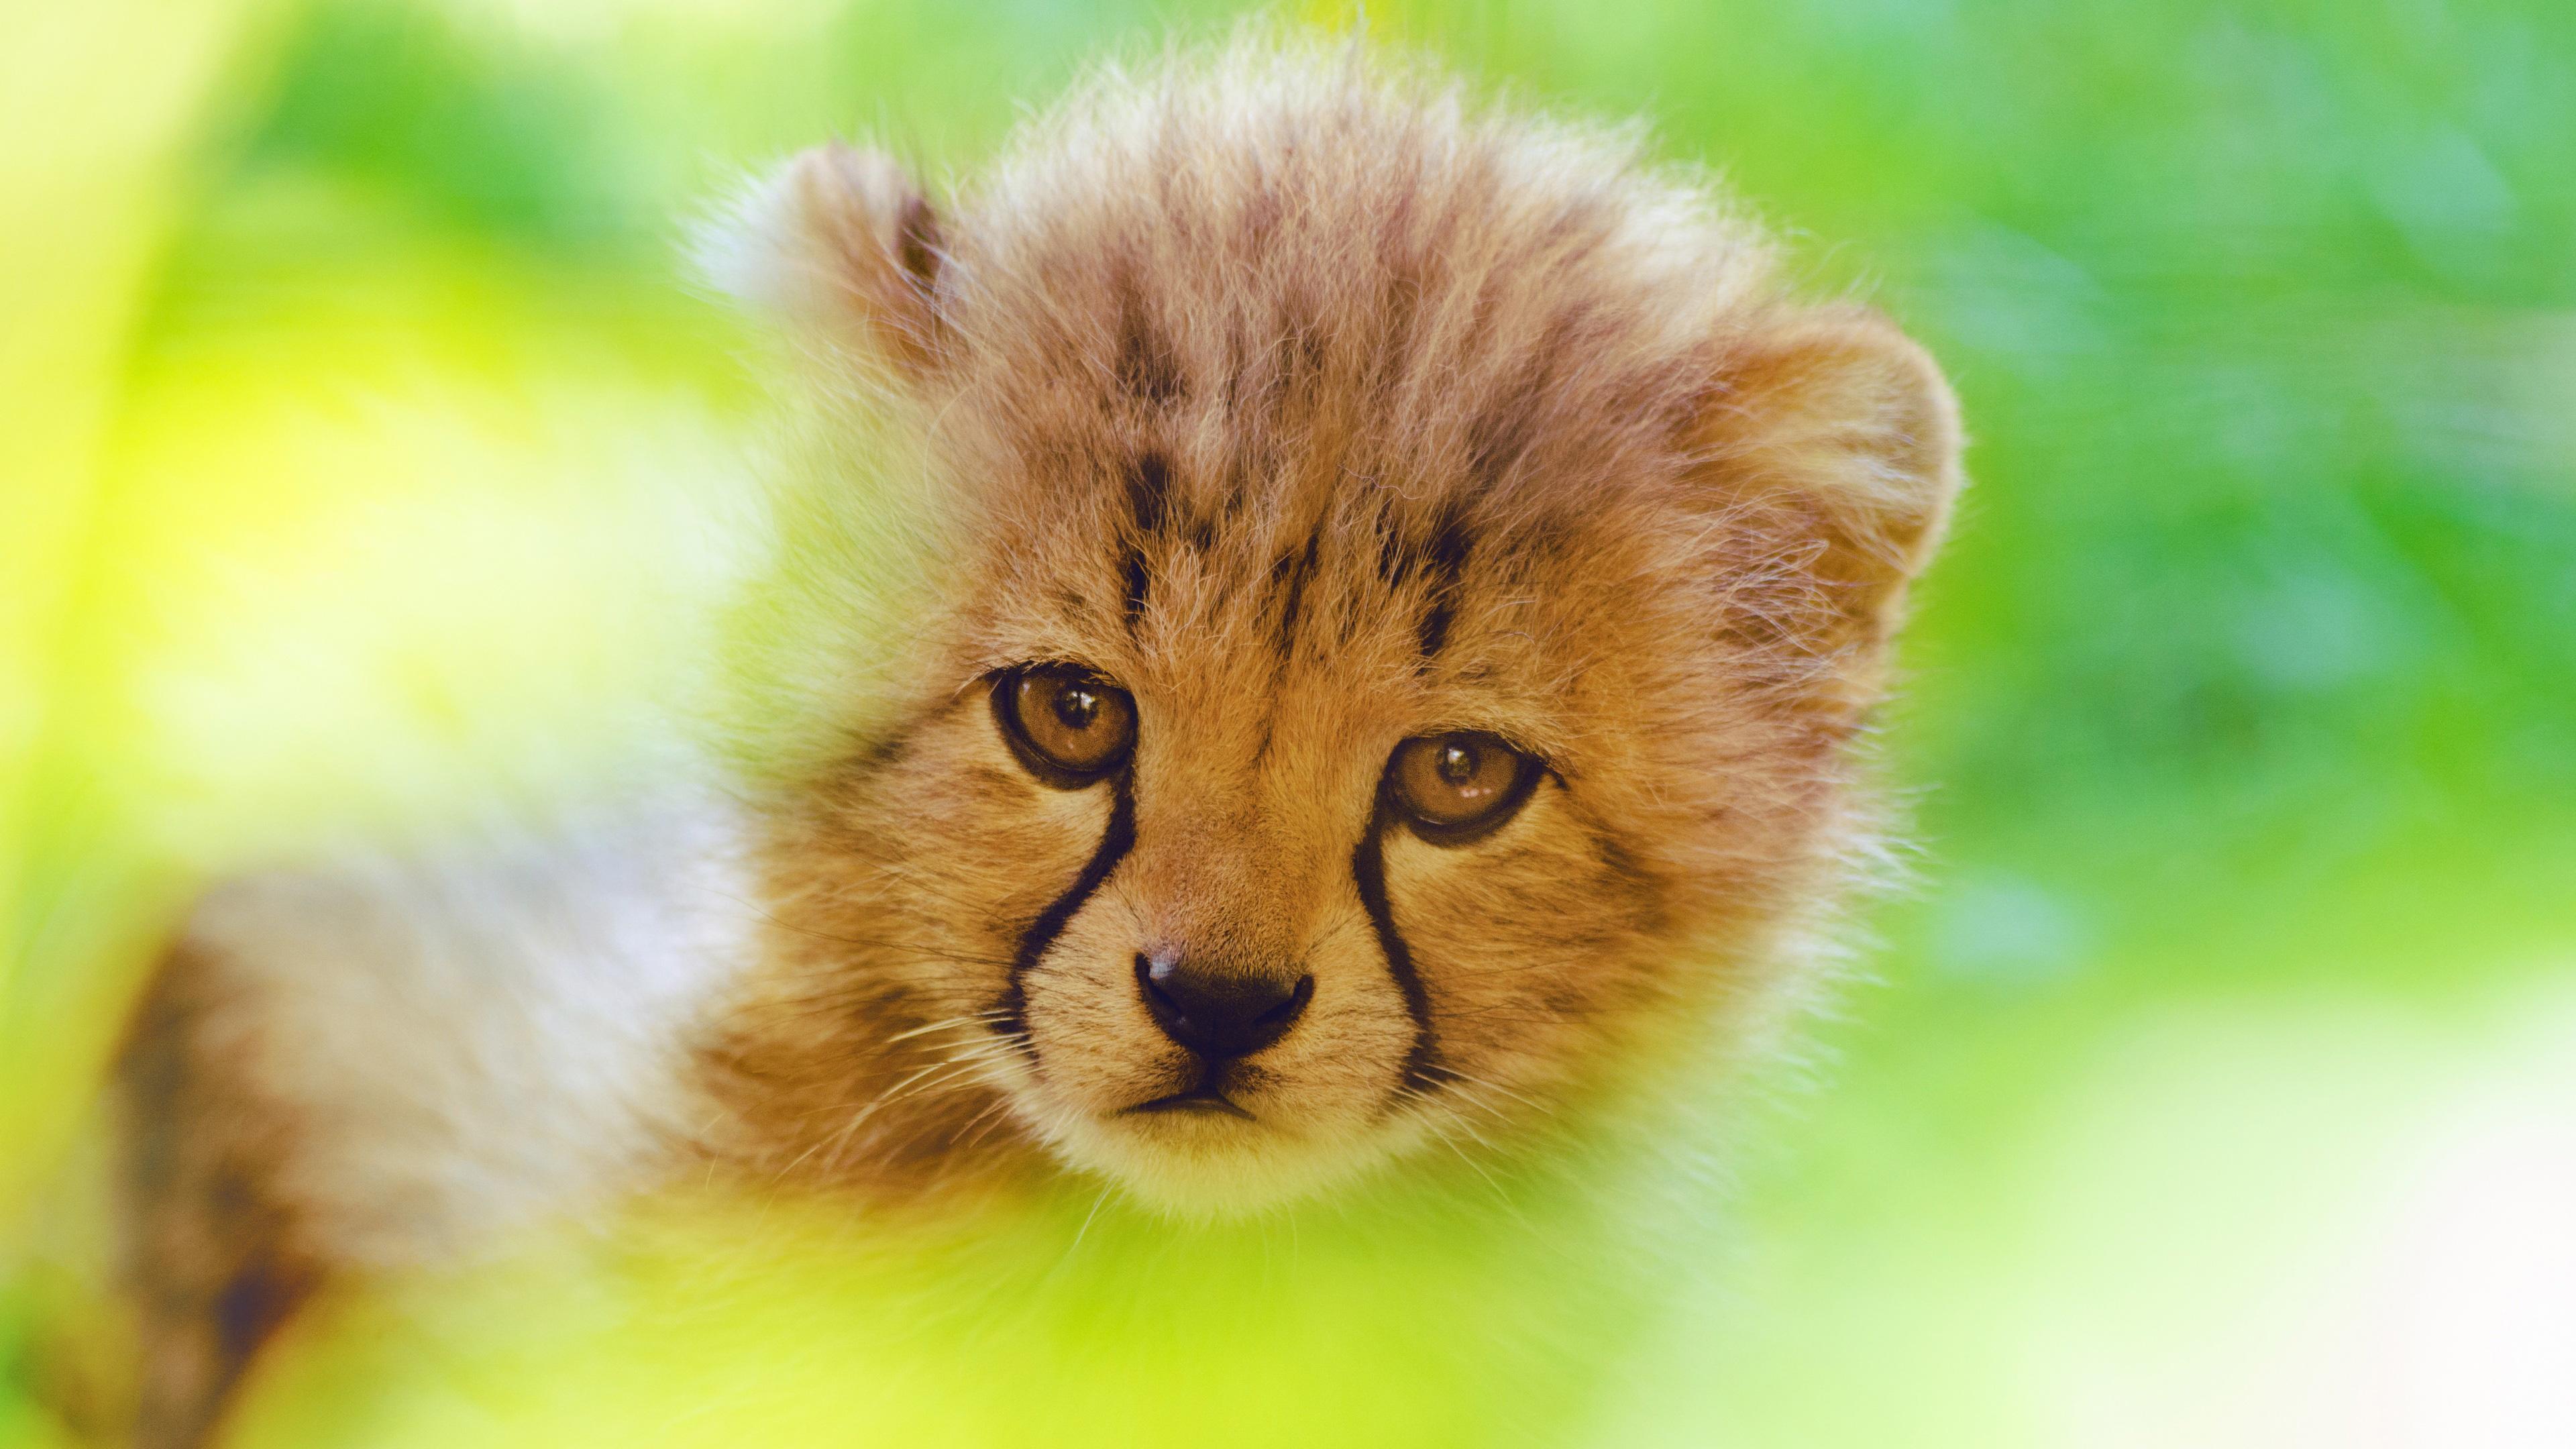 Cheetah Cute Cub 4k, HD Animals, 4k Wallpapers, Images ...